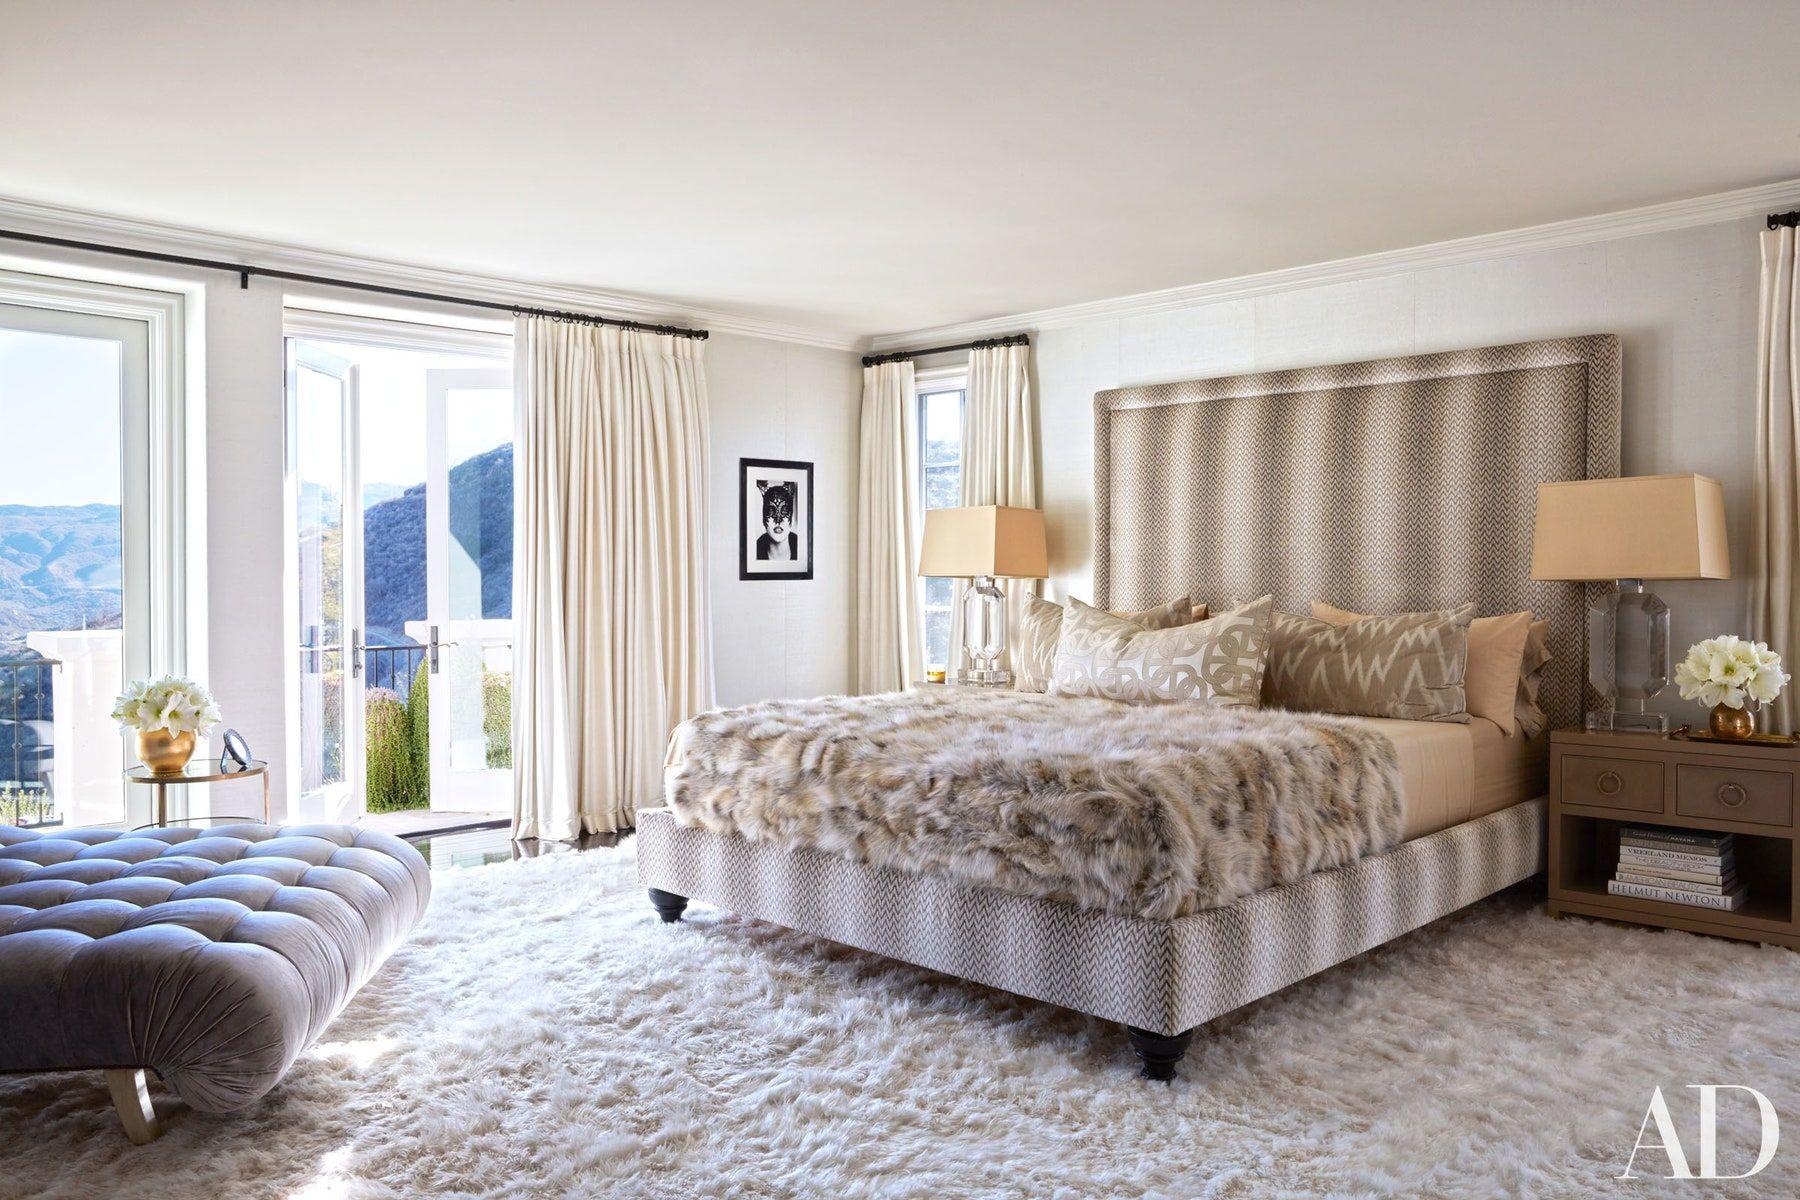 Inside Khloe And Kourtney Kardashian S Houses In California Architectural Digest Kardashian Bedroom Decor Celebrity Bedrooms Kardashian Bedroom Kourtney kardashian bedroom pictures